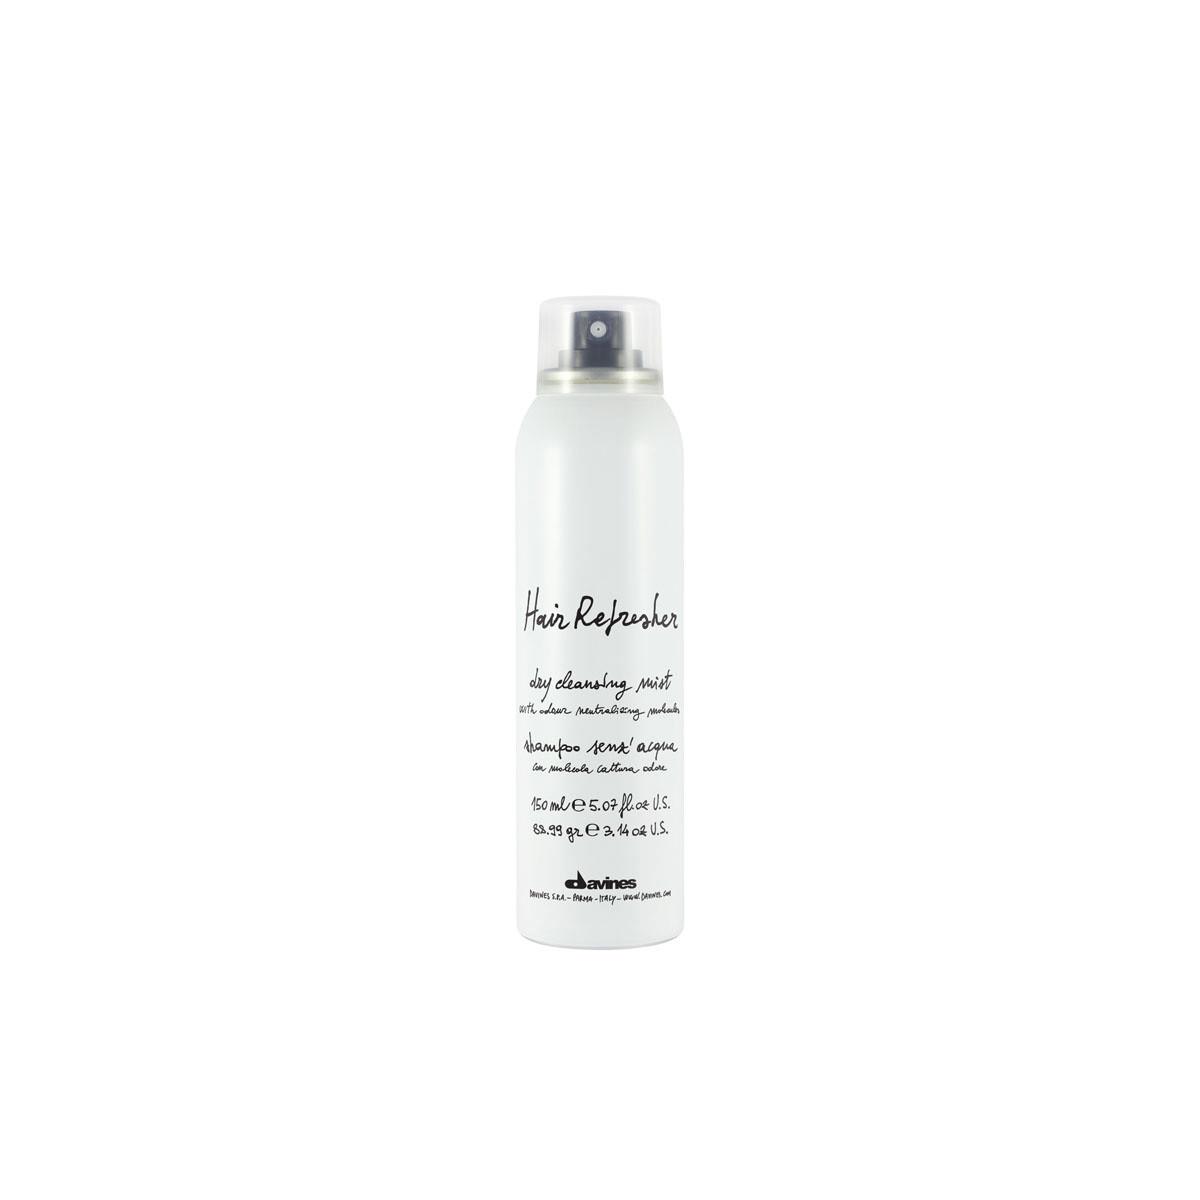 Davines Hair Refresher 150 ml | Shampoo en Seco